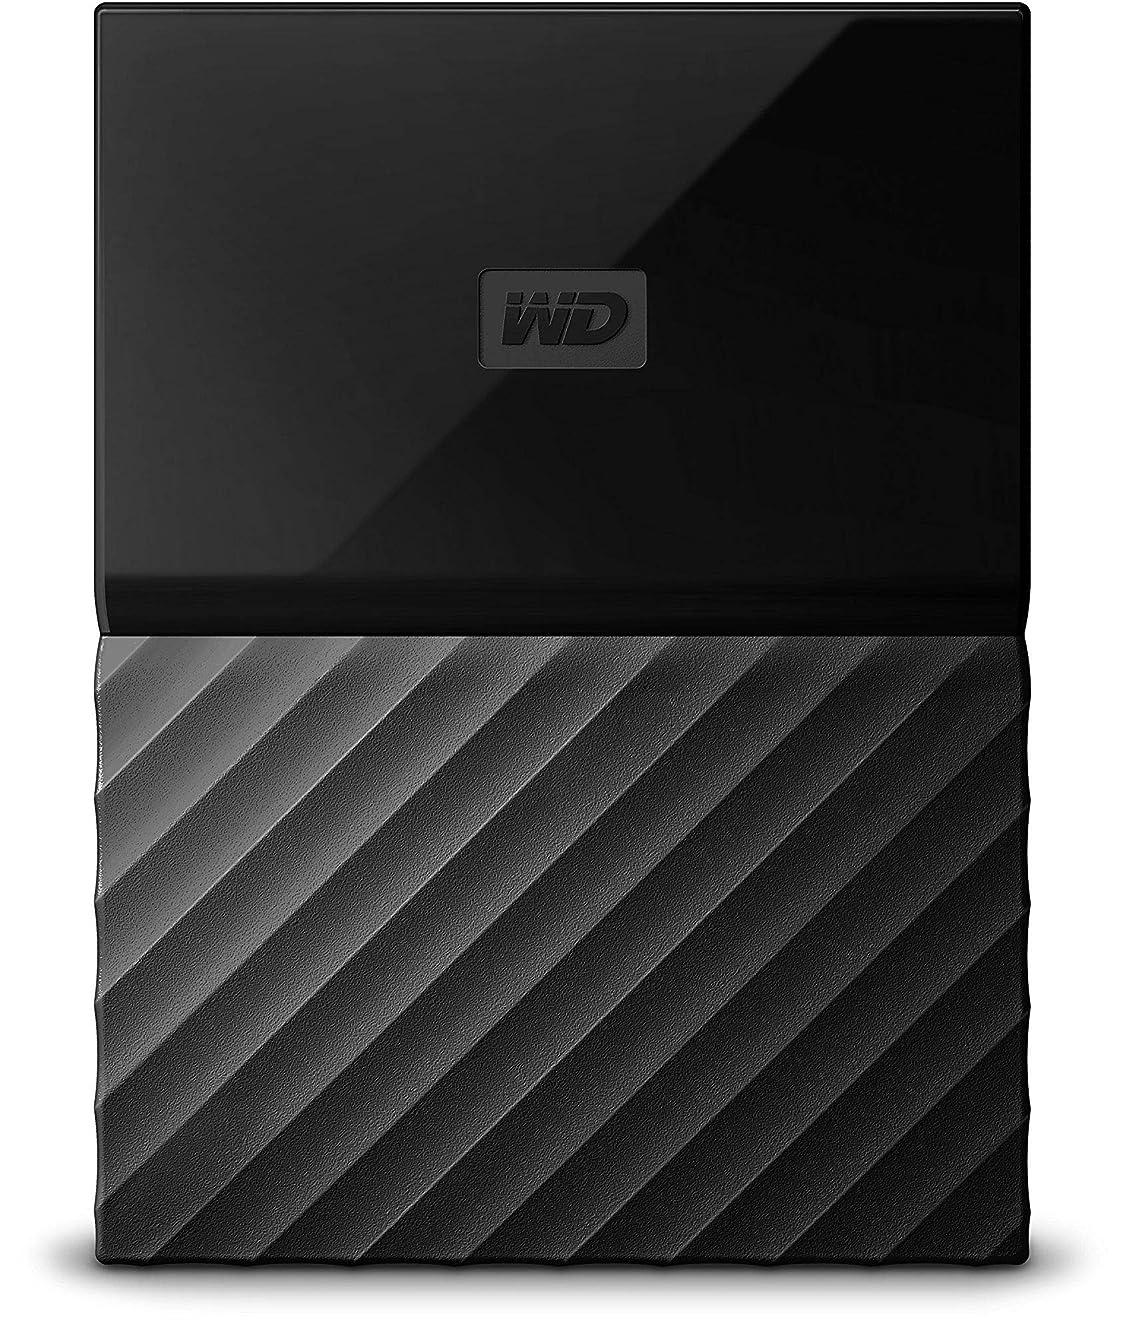 Western Digital 4TB Black My Passport  Portable External Hard Drive - USB 3.0 - WDBYFT0040BBK-WESN